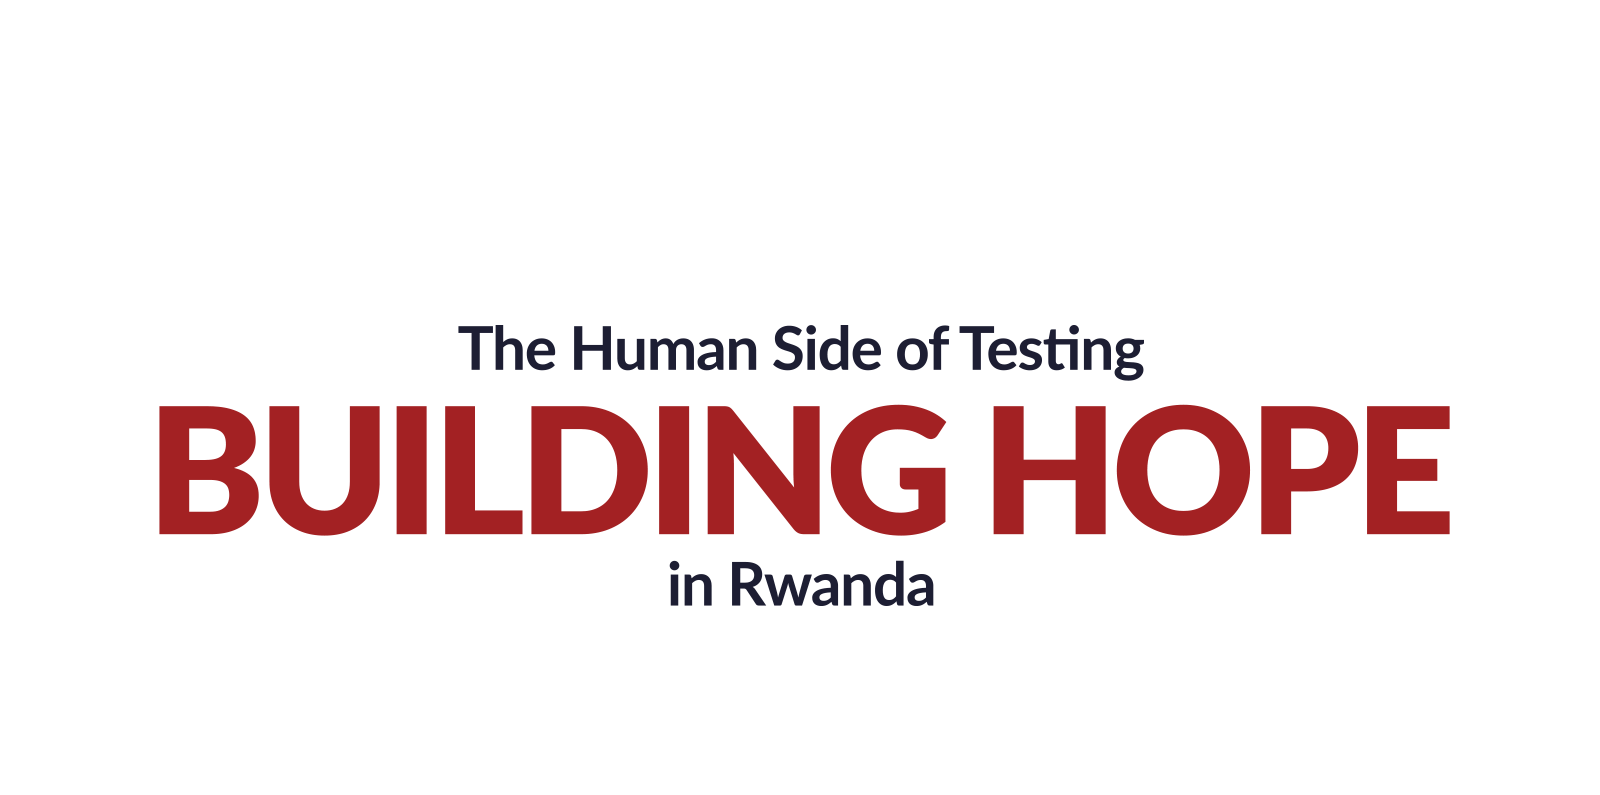 The Human Side of Testing: Building Hope in Rwanda